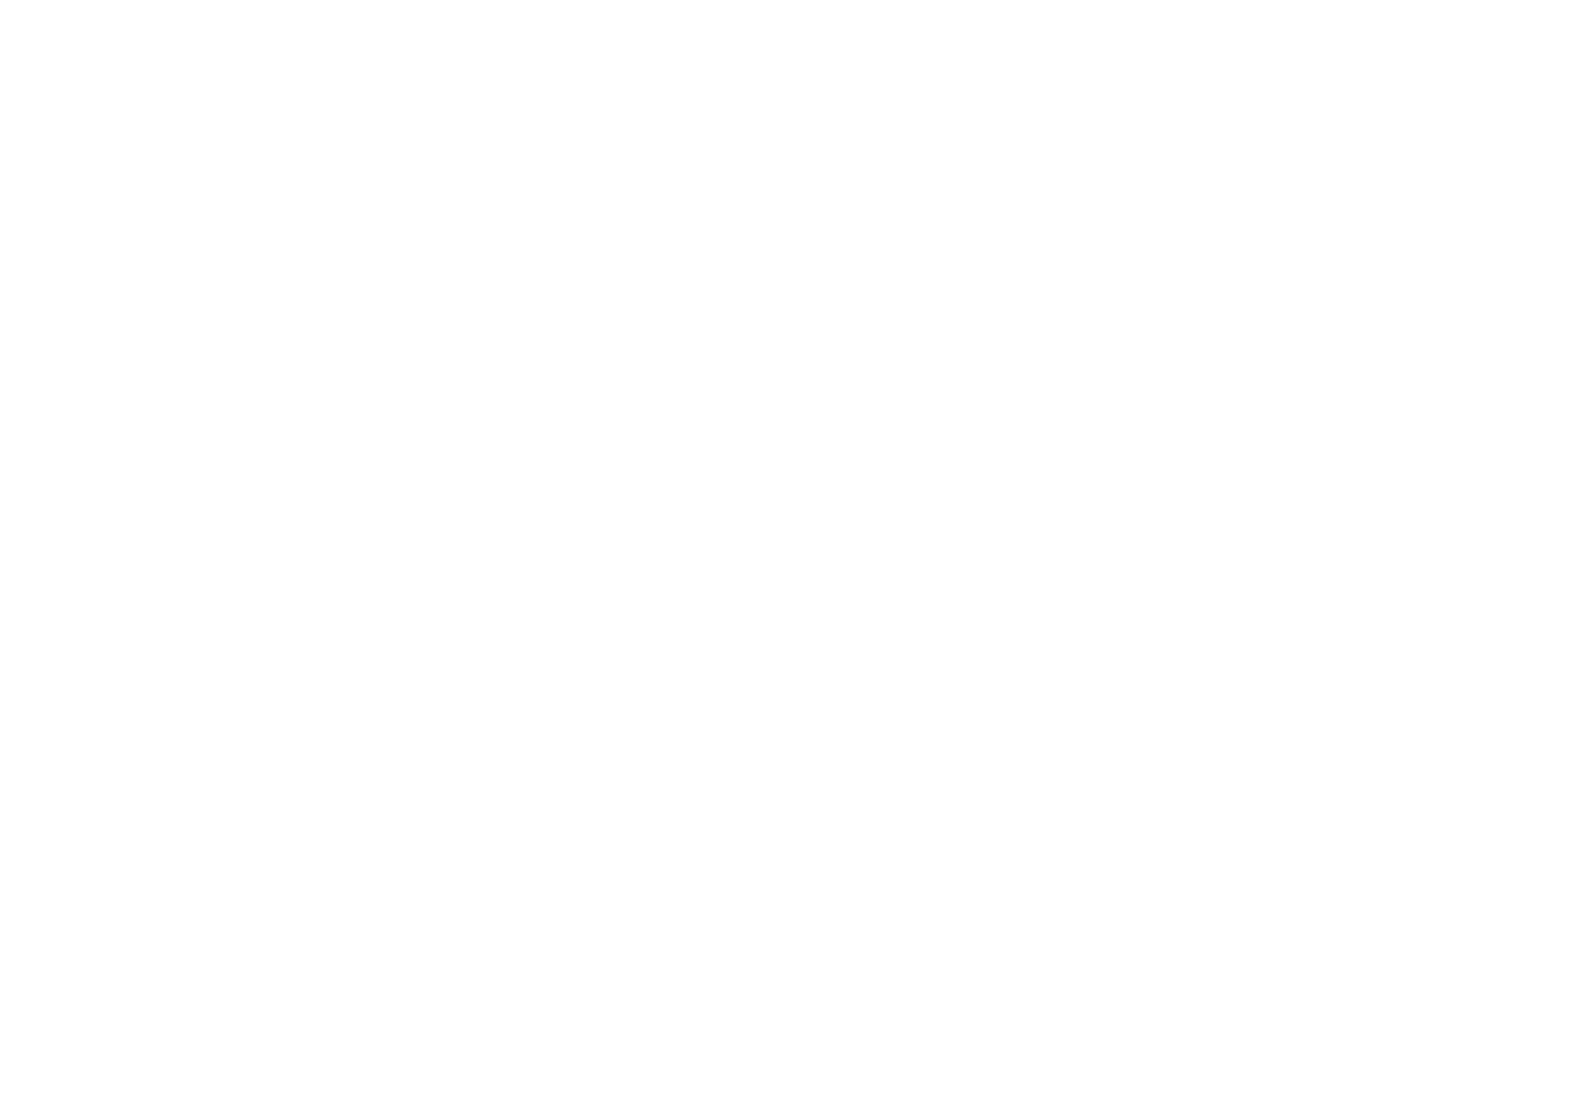 Alcaldía de Medellín